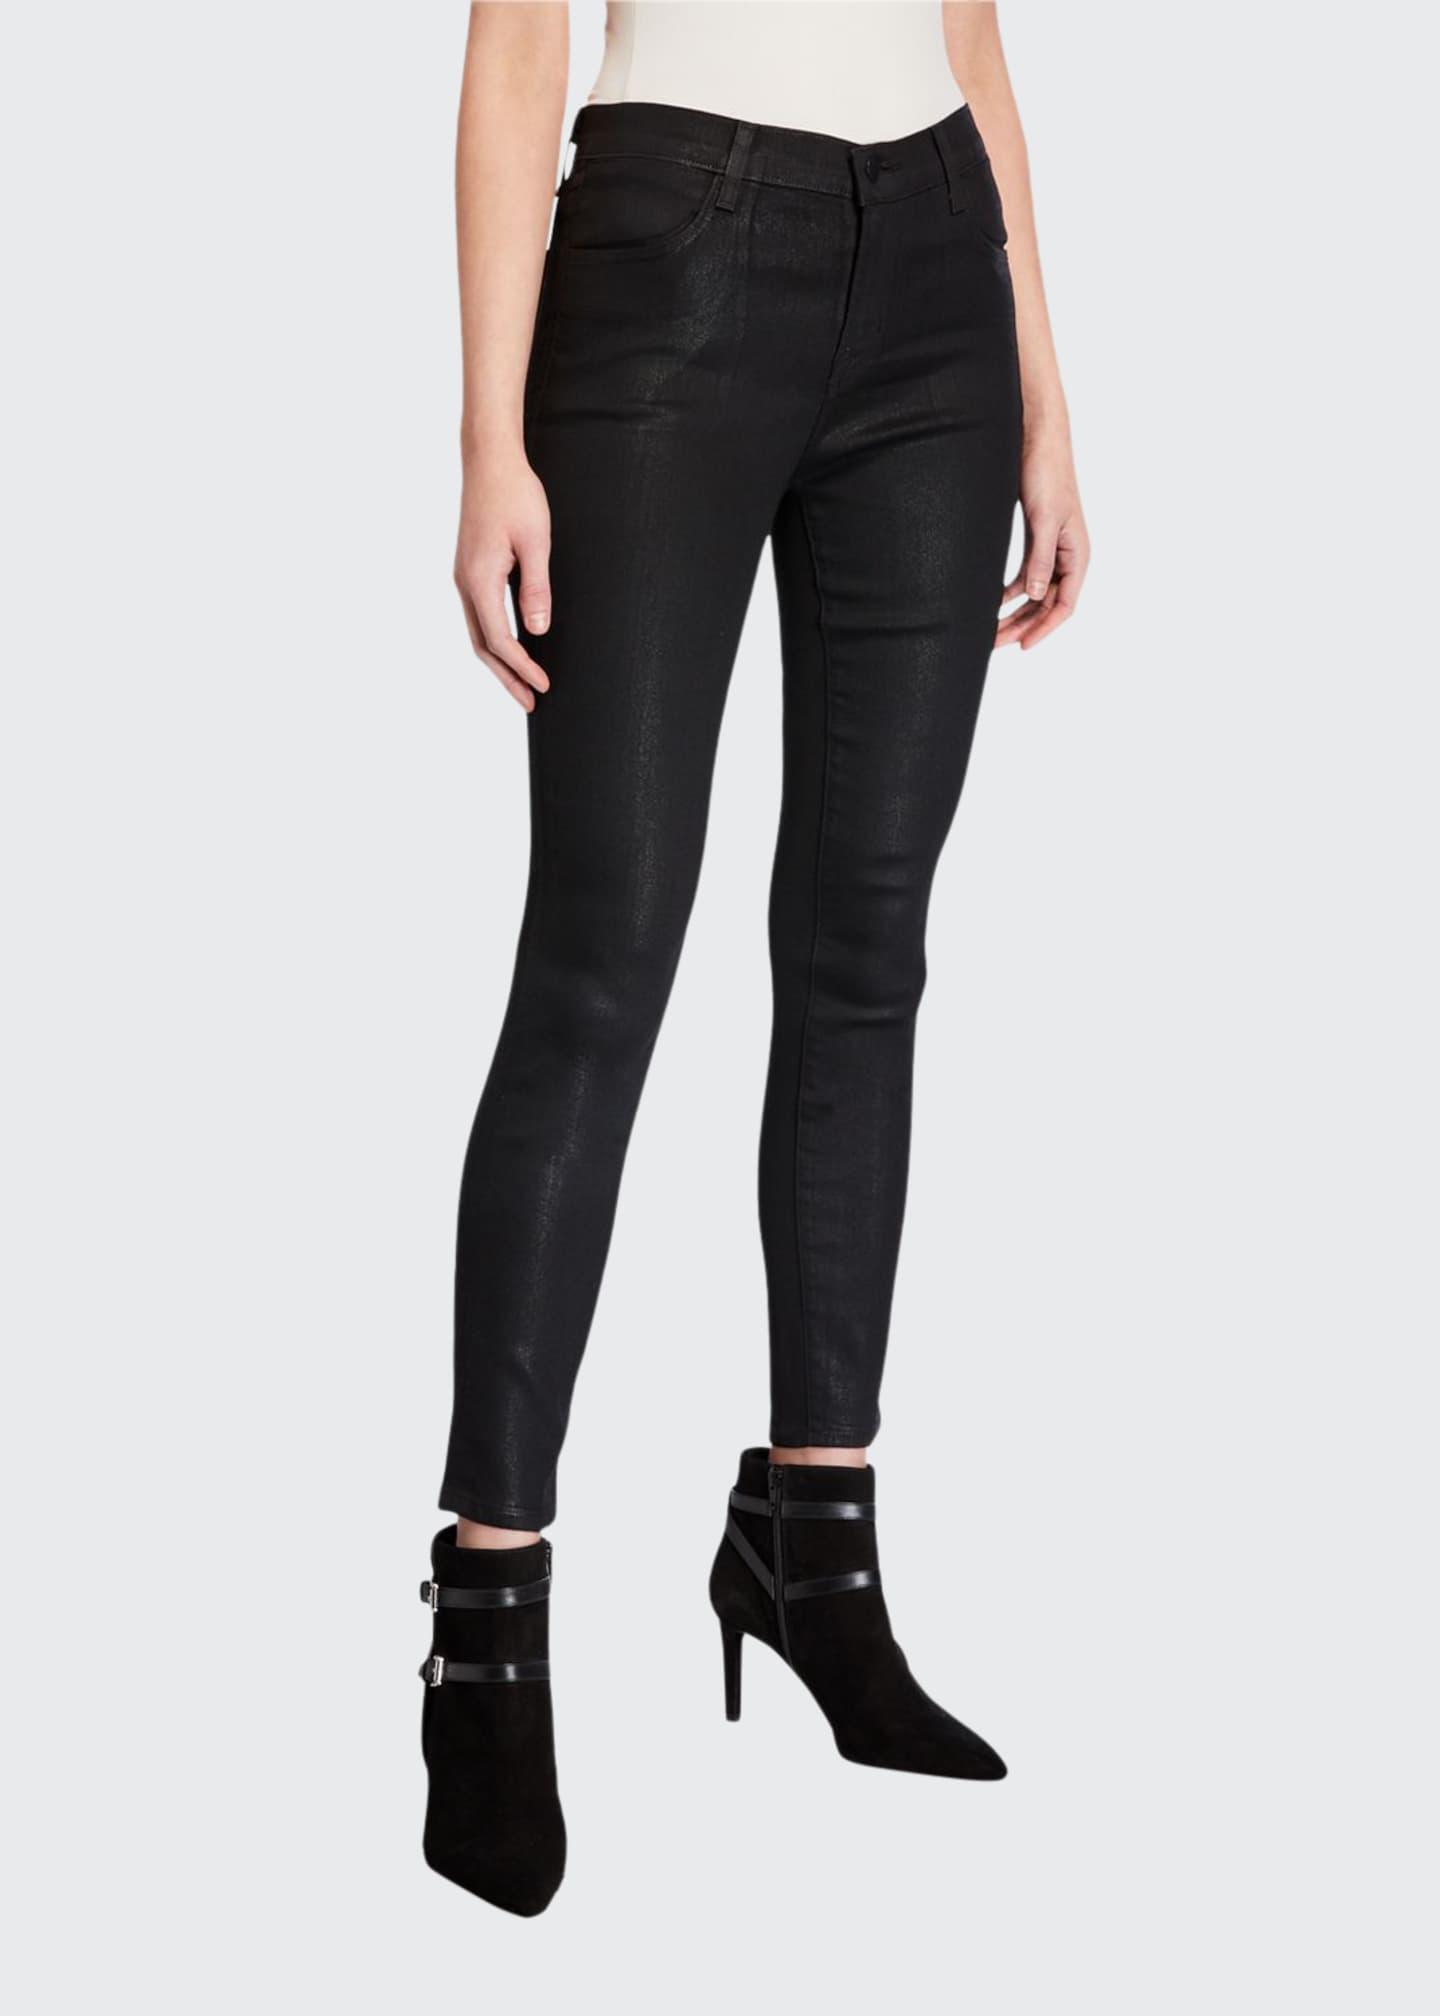 J Brand Alana High-Rise Cropped Coated Skinny Pants